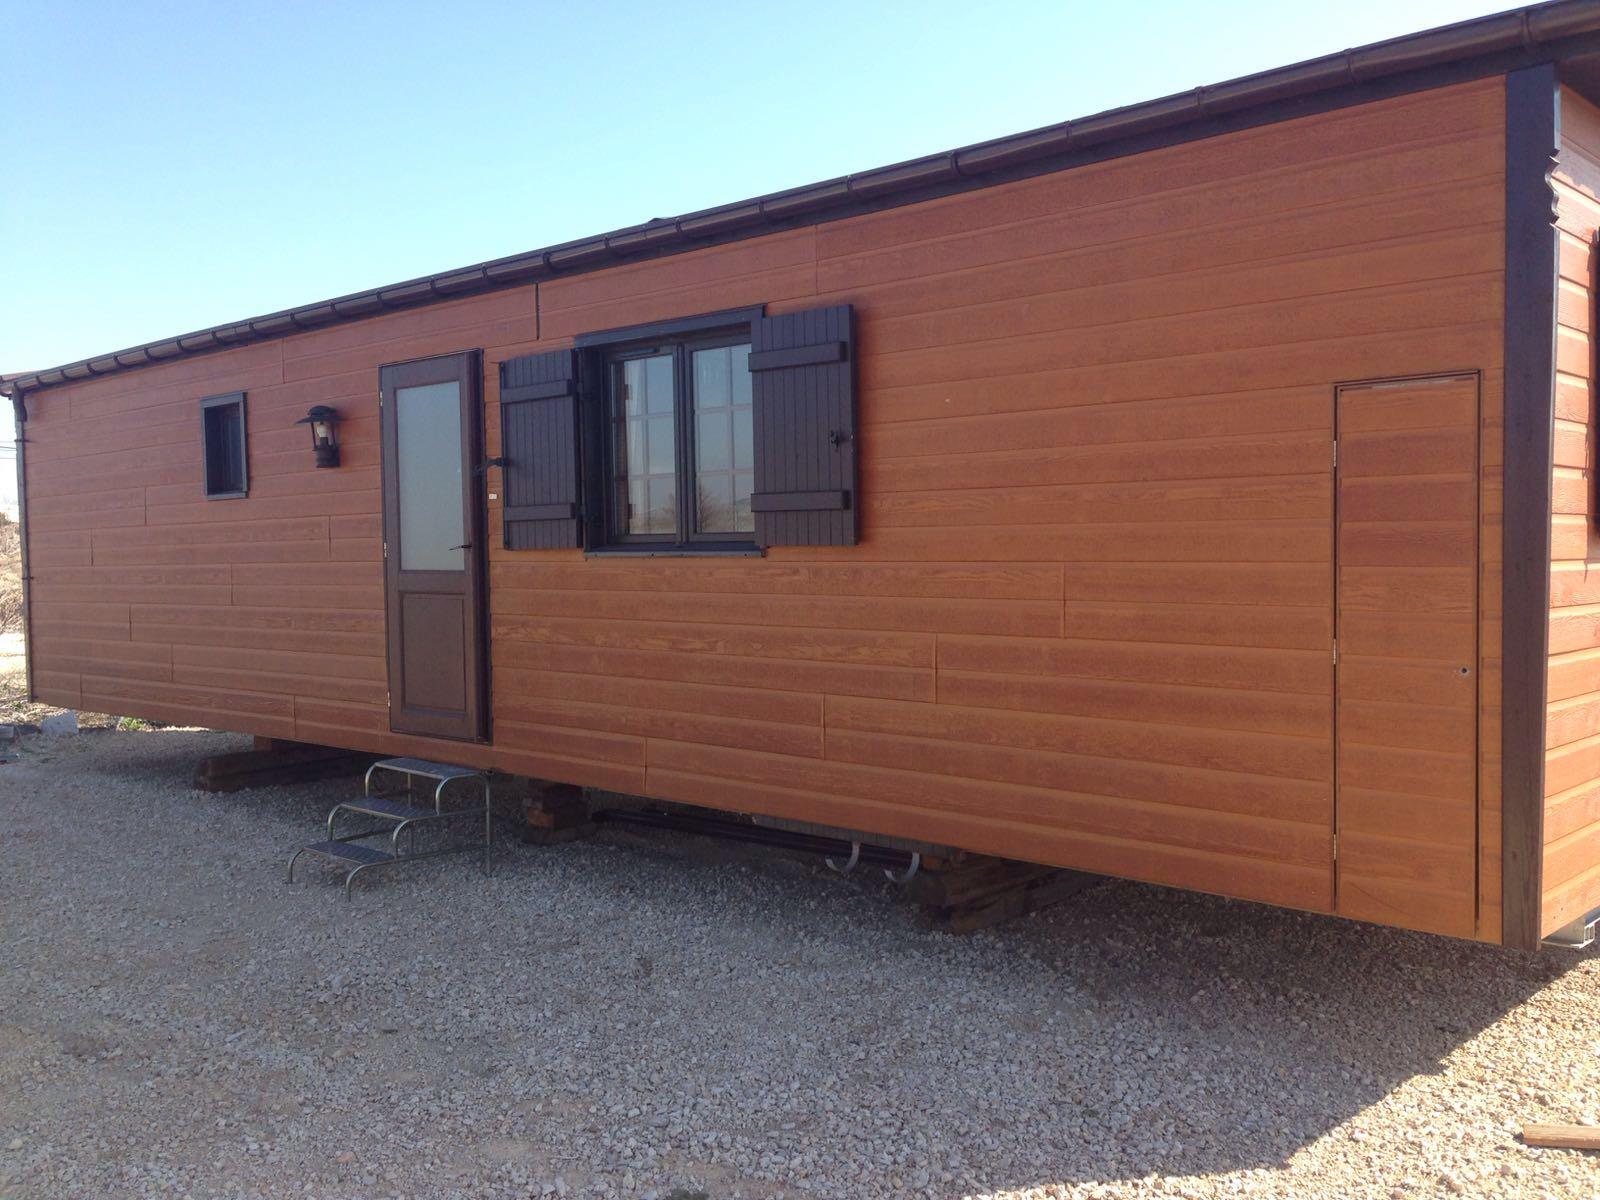 235fdhfdhvnvnvn europa mobil home - Casas prefabricadas canexel ...